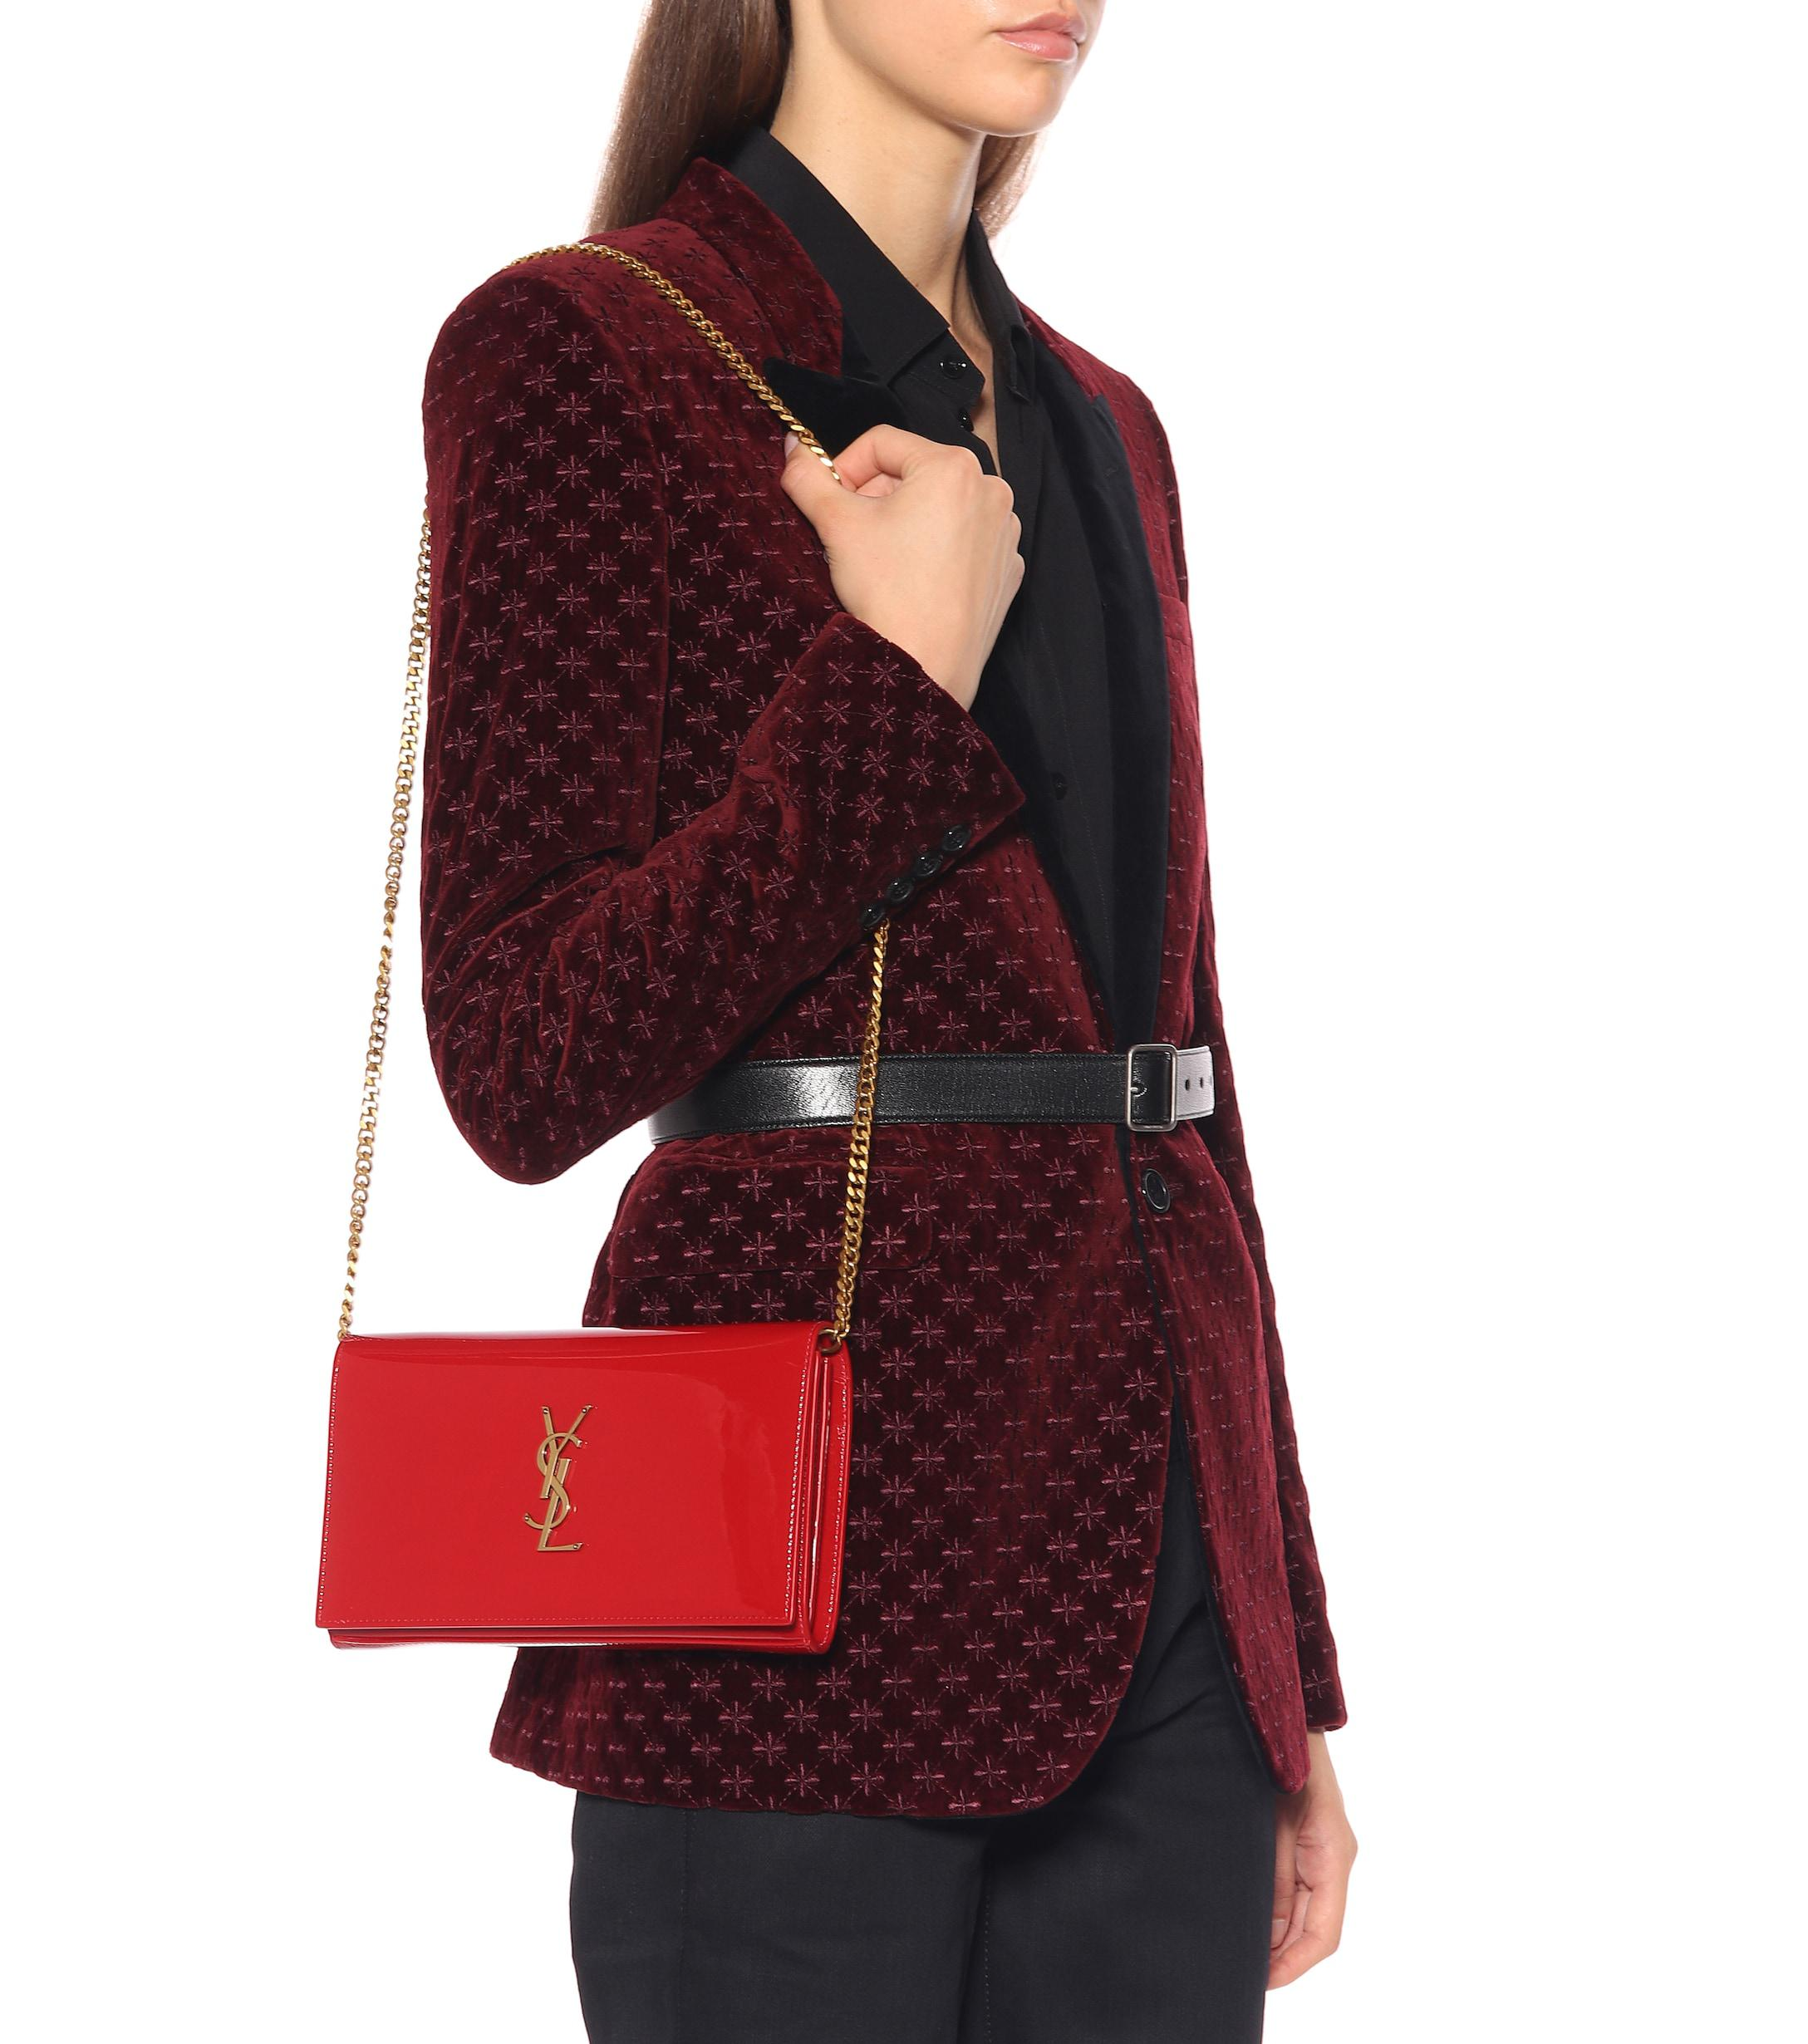 e67b0cf2ef Saint Laurent - Red Kate Wallet Leather Shoulder Bag - Lyst. View fullscreen